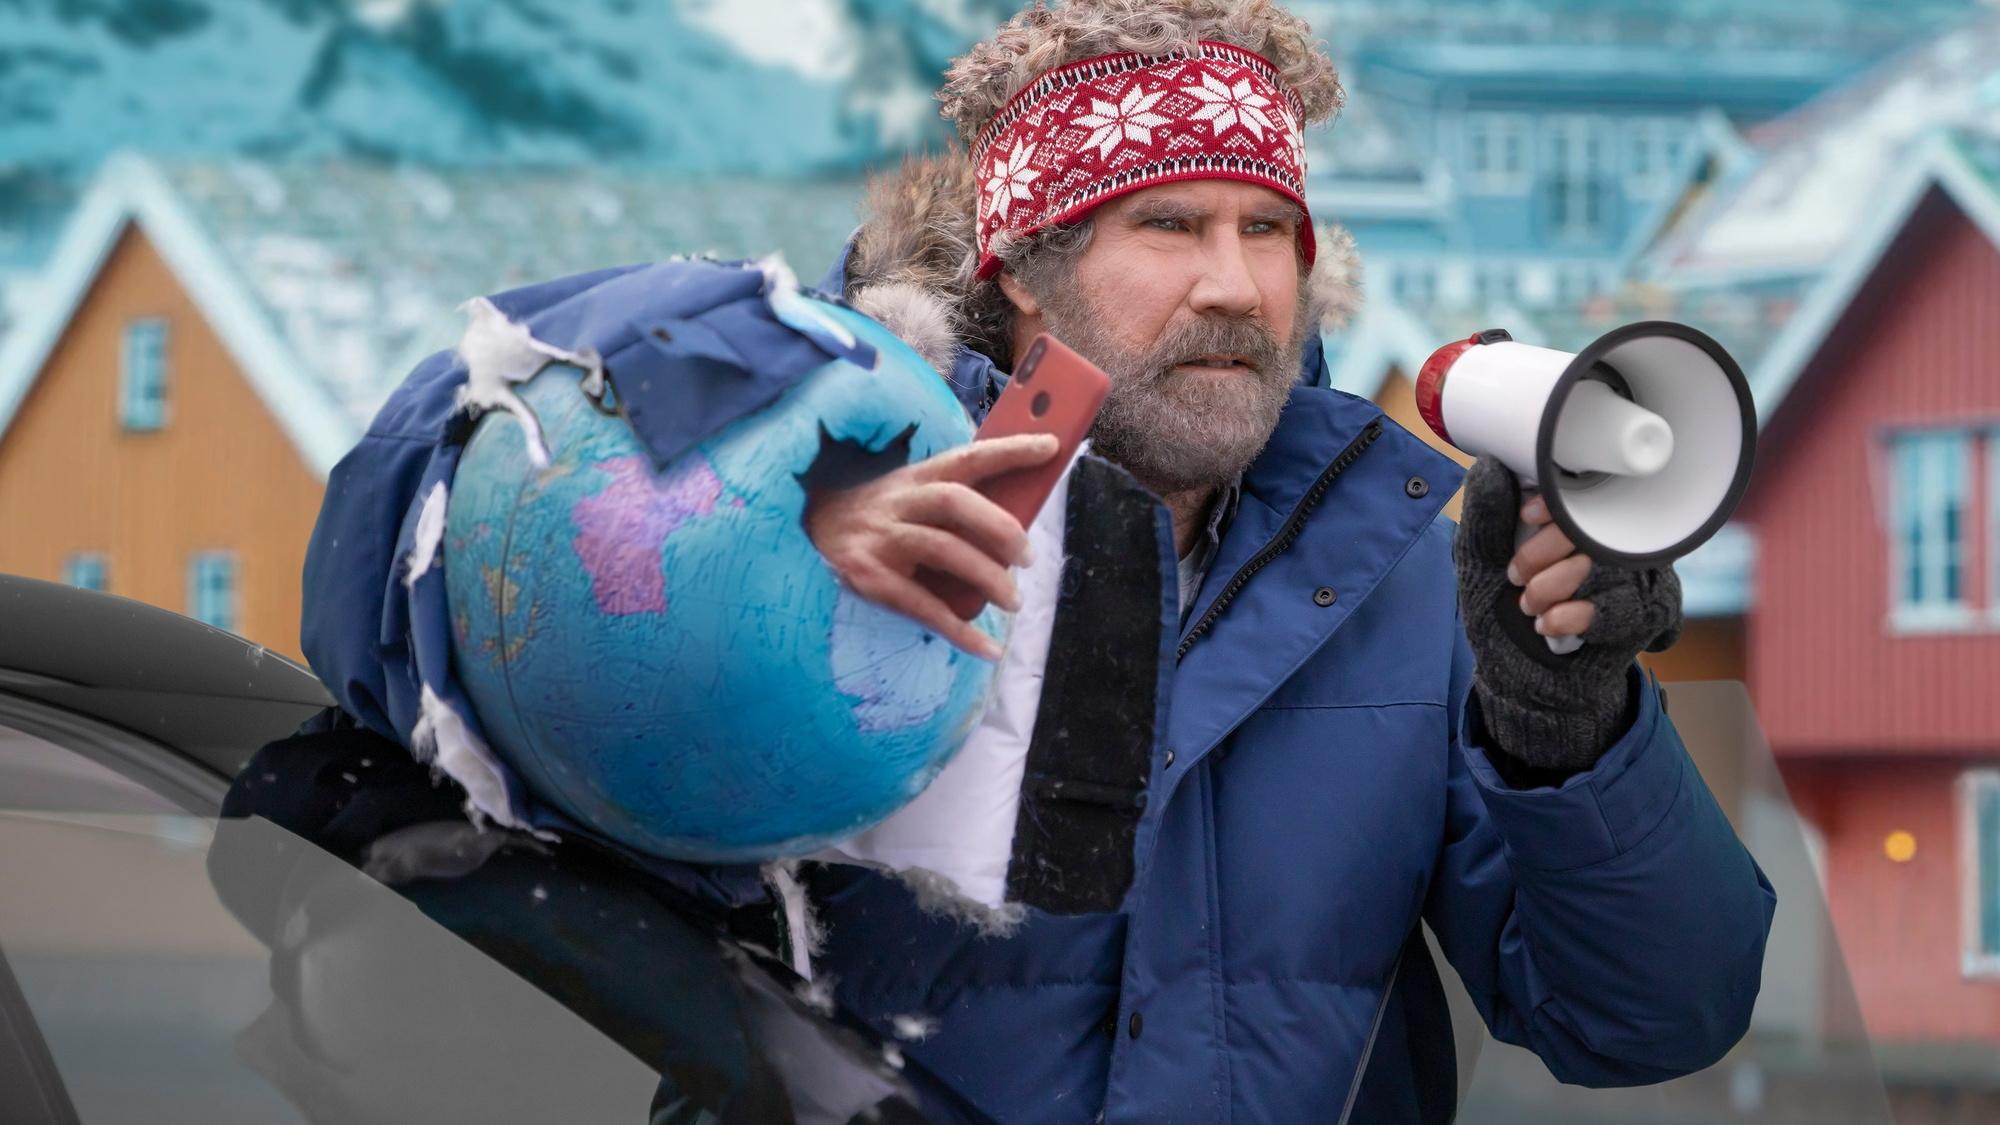 GM 2021 Super Bowl ad starring Will Ferrell